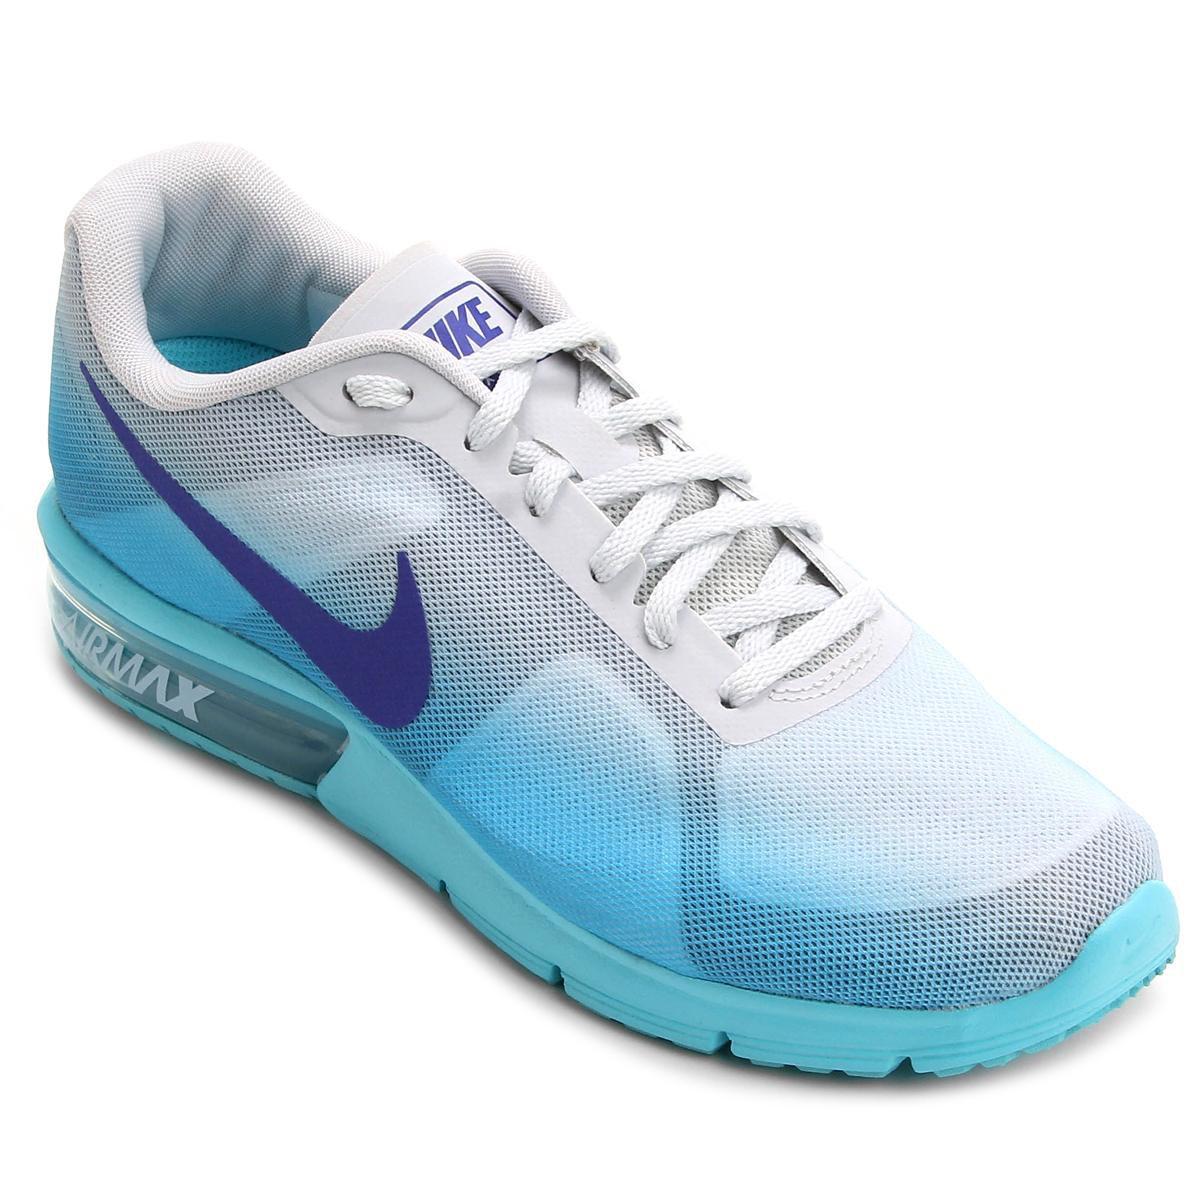 c2c8821210700 Tênis Nike Air Max Sequent Feminino - Compre Agora